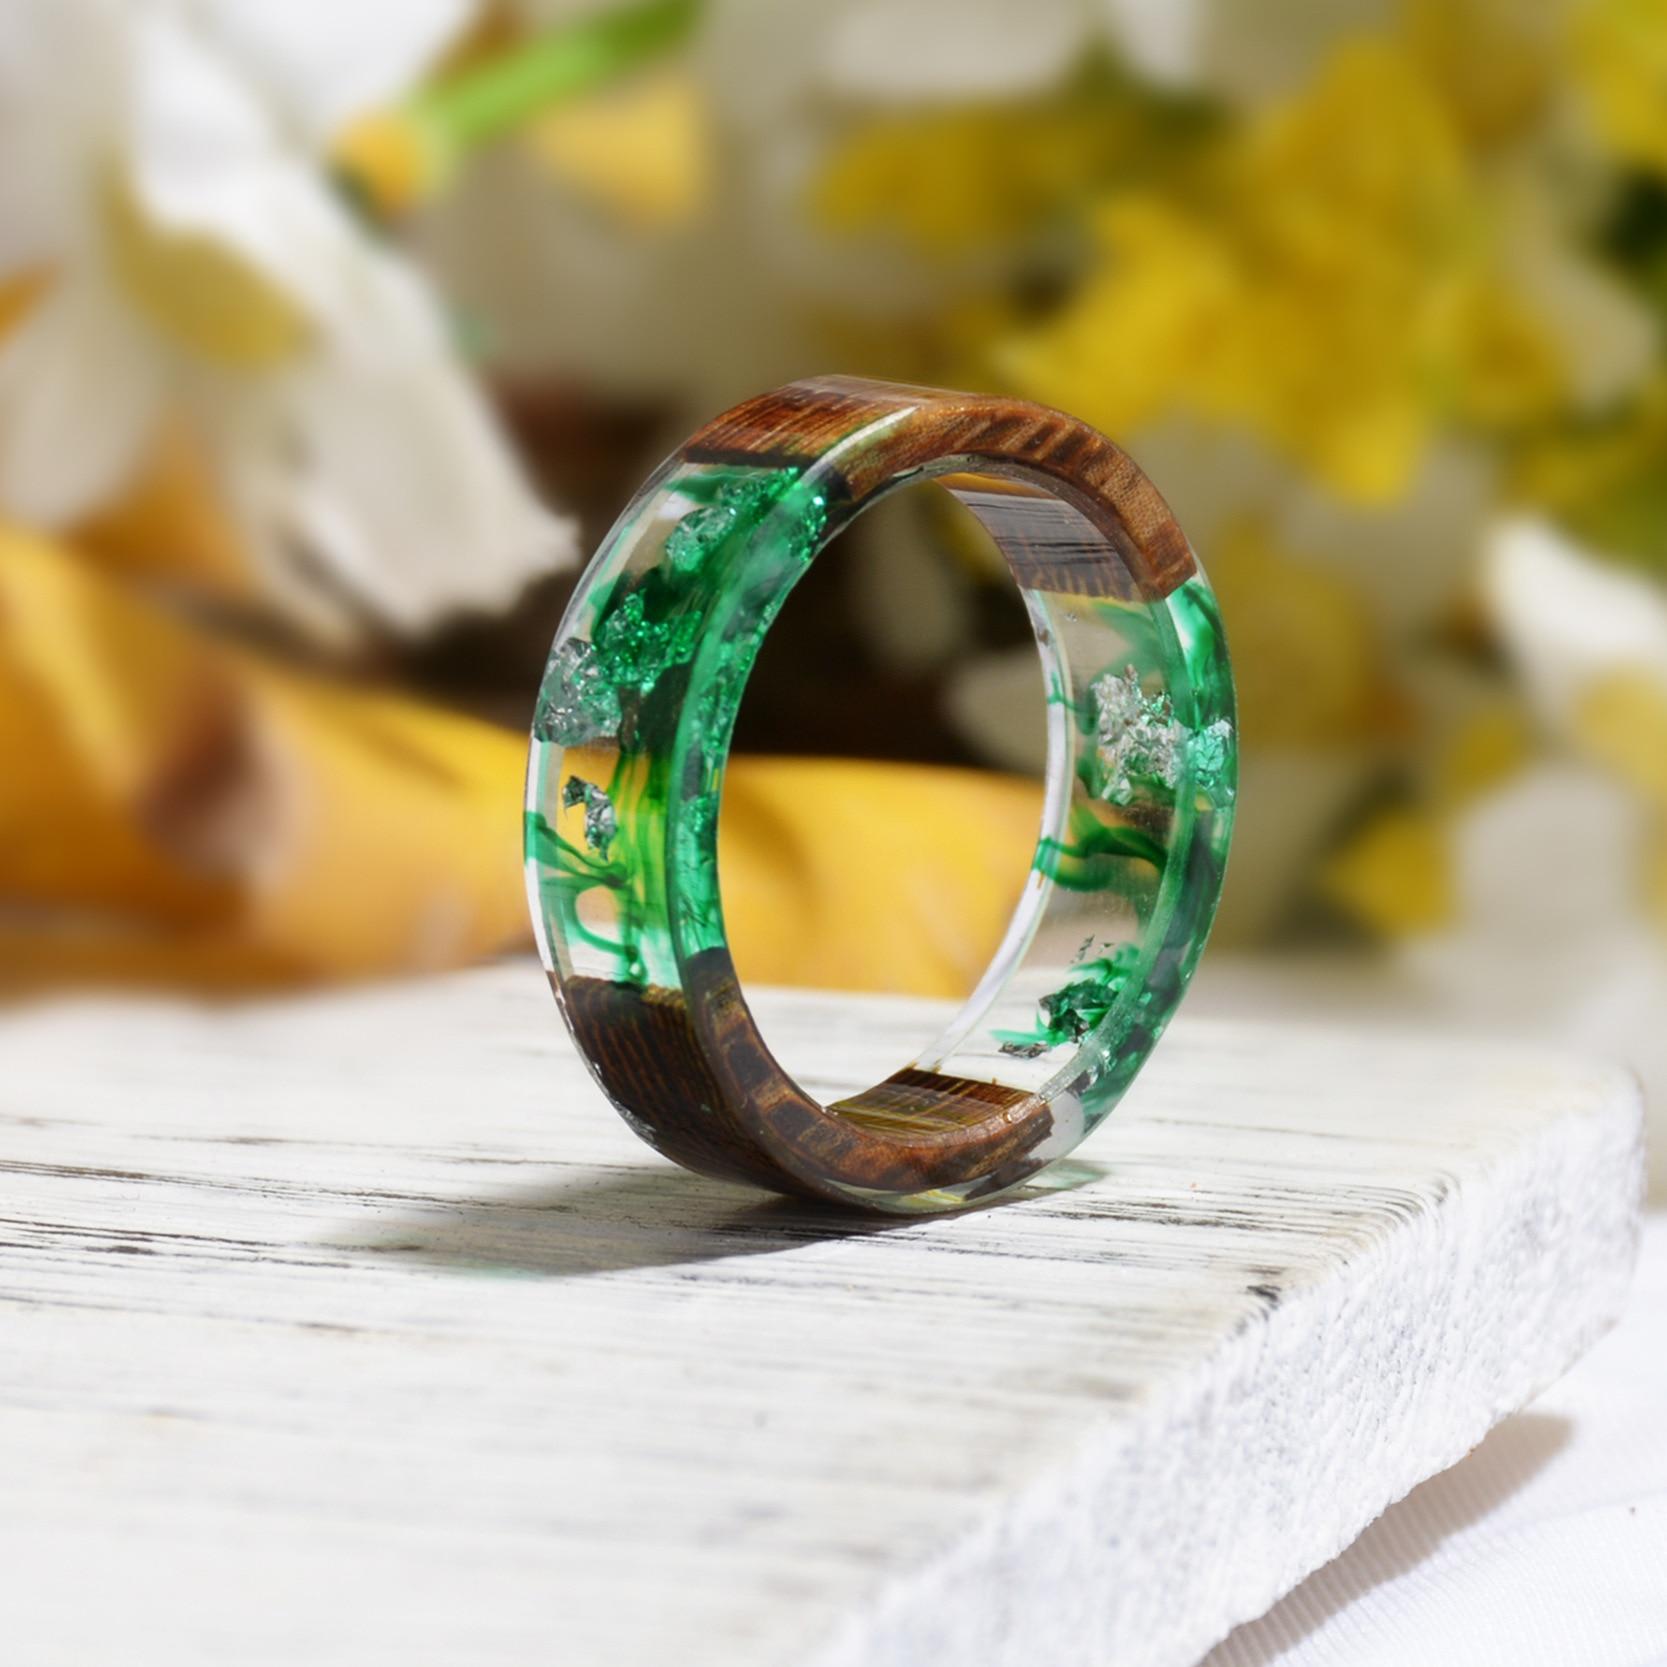 Handmade DIY Dried Flower Wood Resin Ring Elegant Women Wedding Party Rings Gift